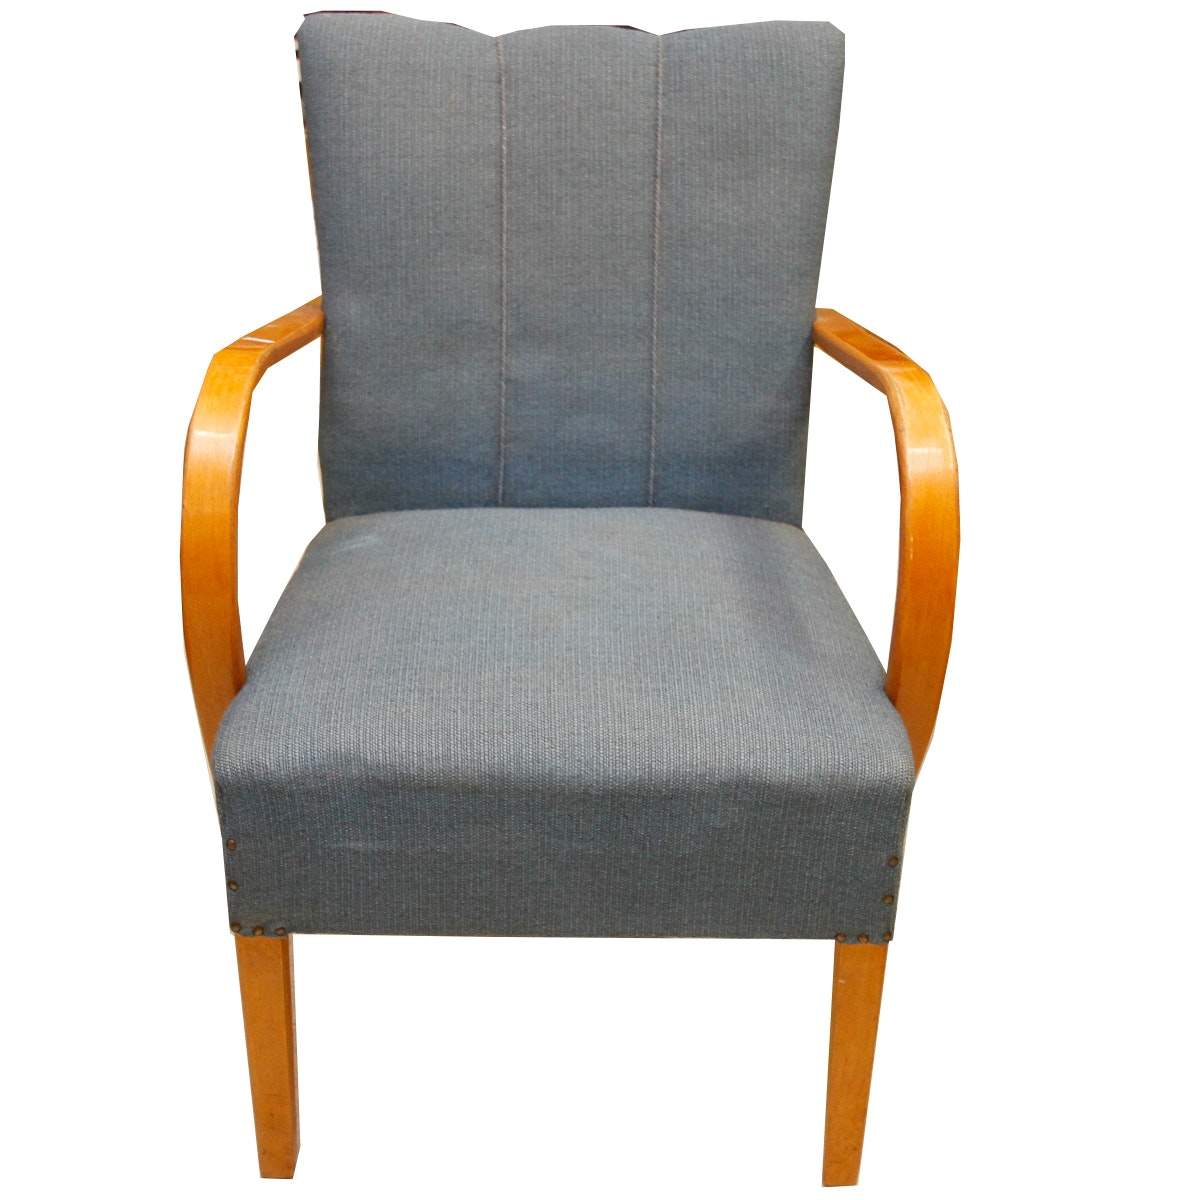 Danish Modern Style Armchair